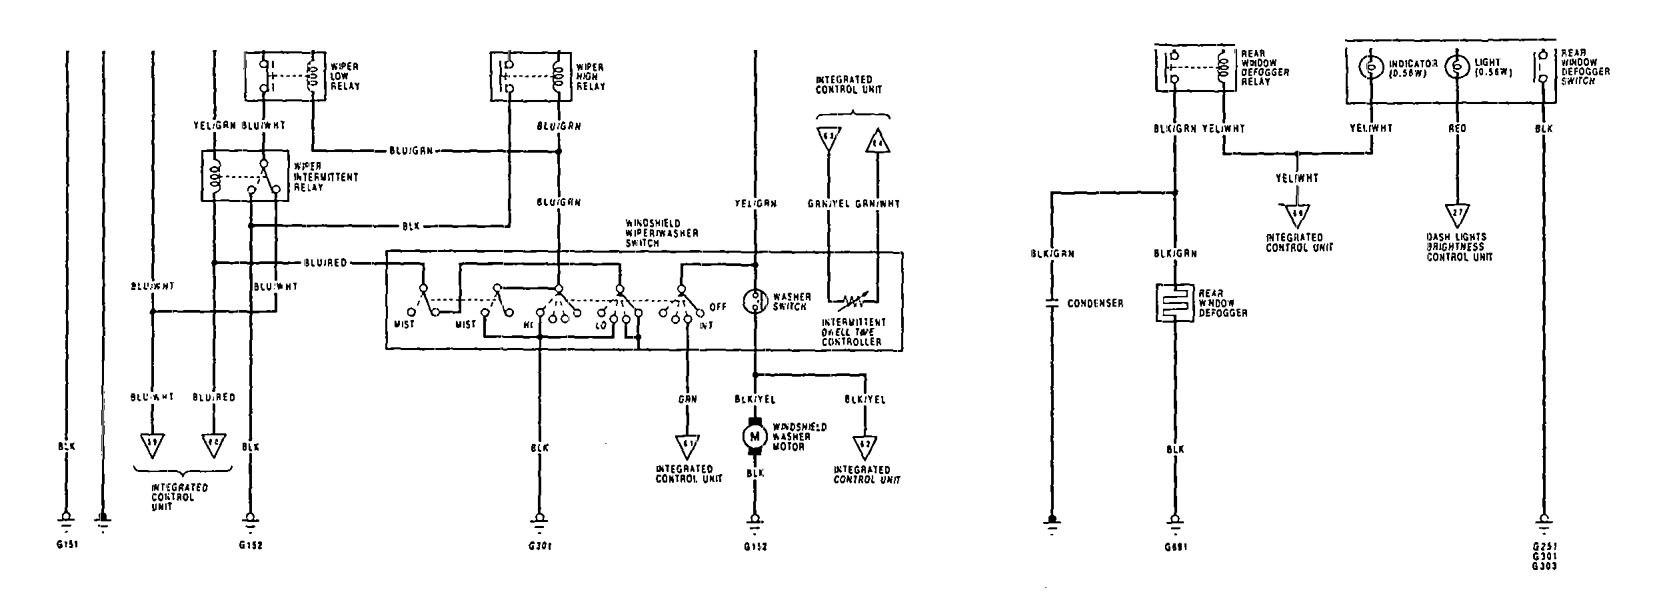 1992 Acura Vigor Wiring Diagram 1964 Ford Mustang Fuse Box Cts Lsa Losdol2 Jeanjaures37 Fr